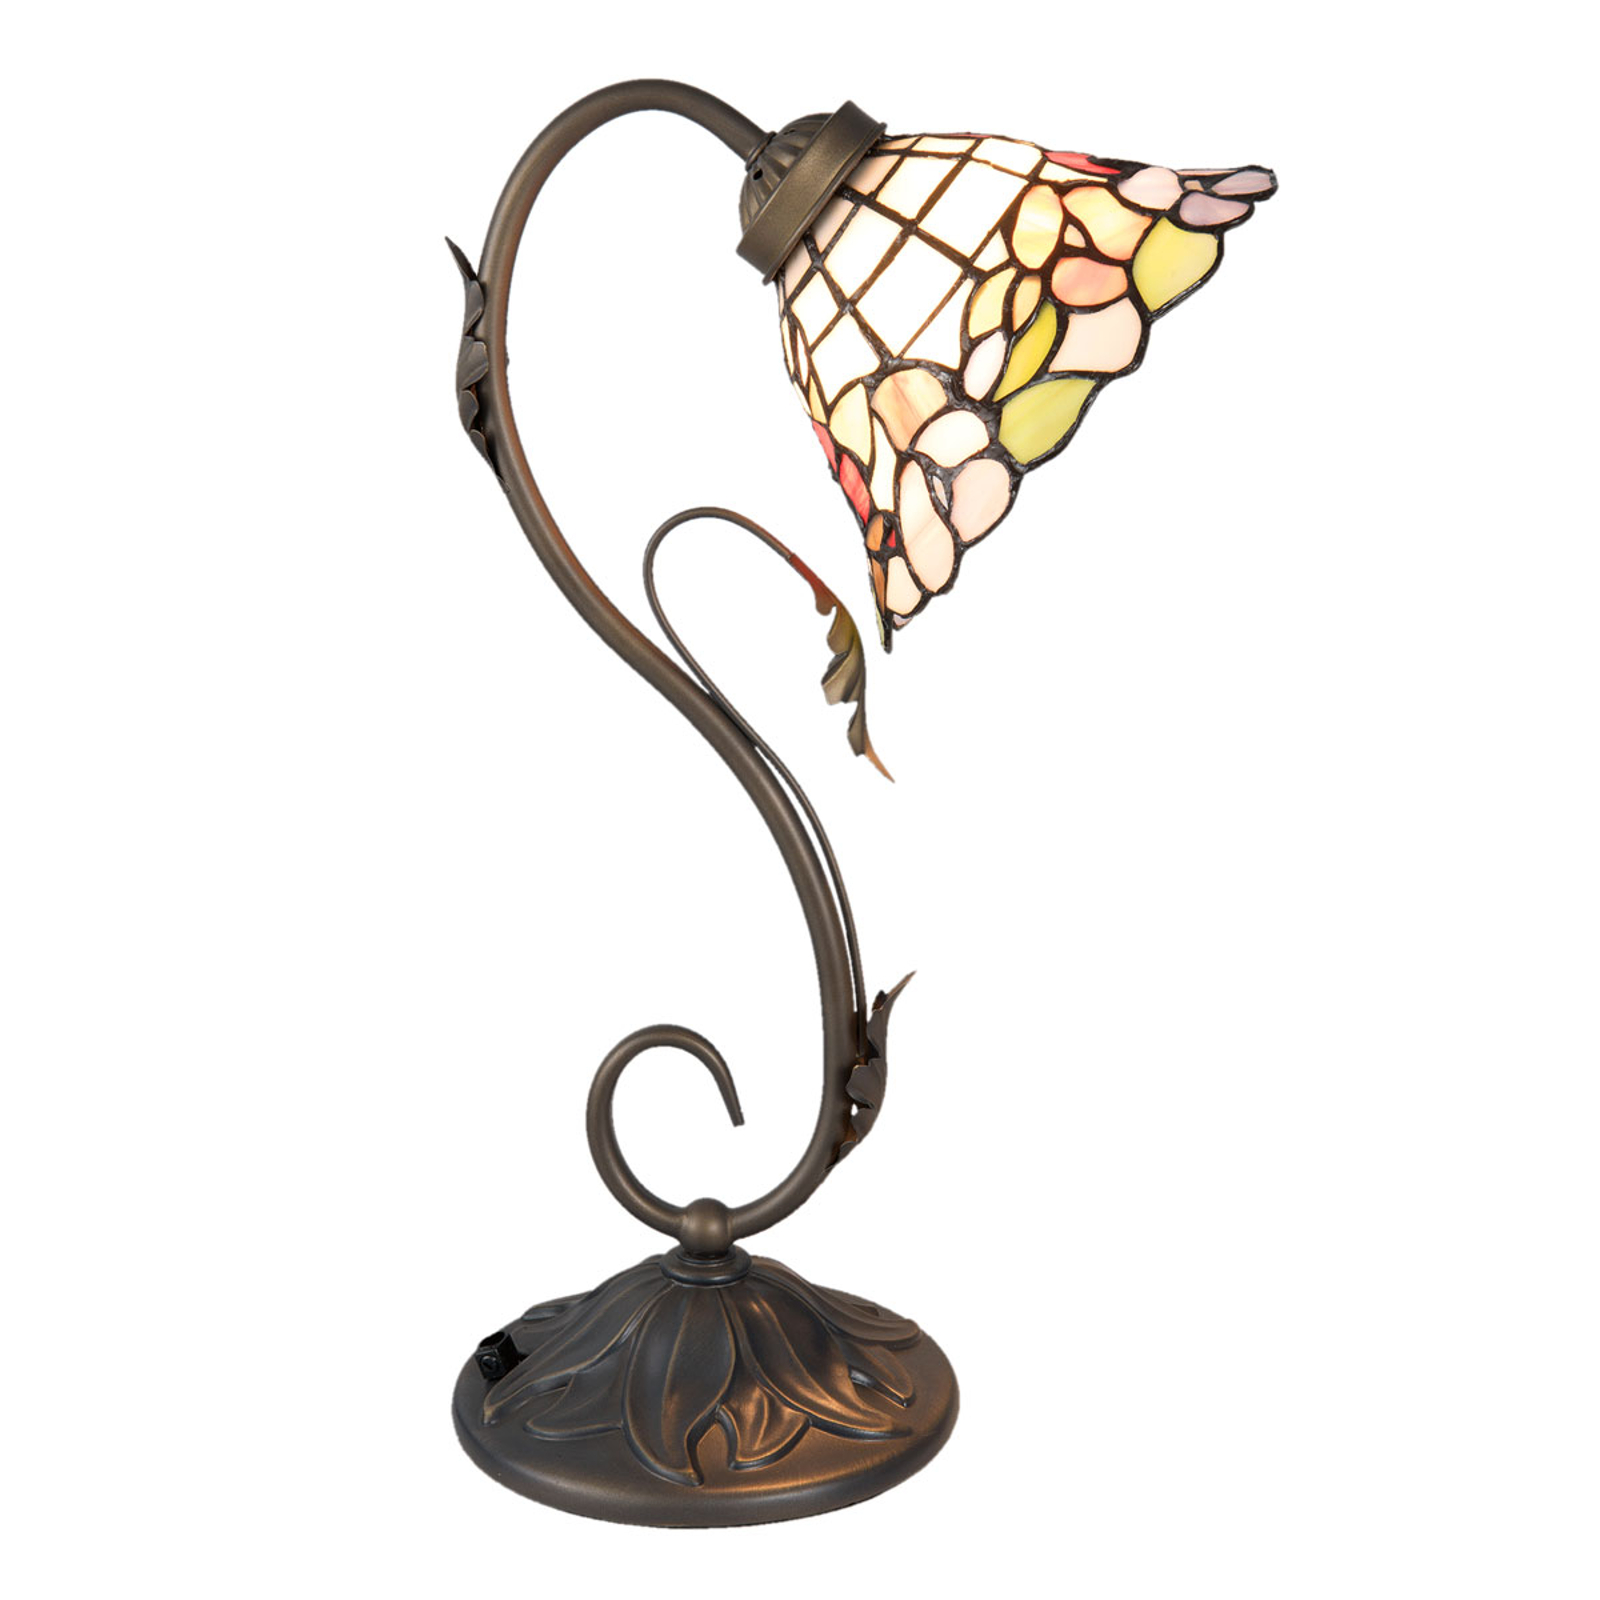 Tafellamp 5920, gebogen vorm, Tiffany-stijl